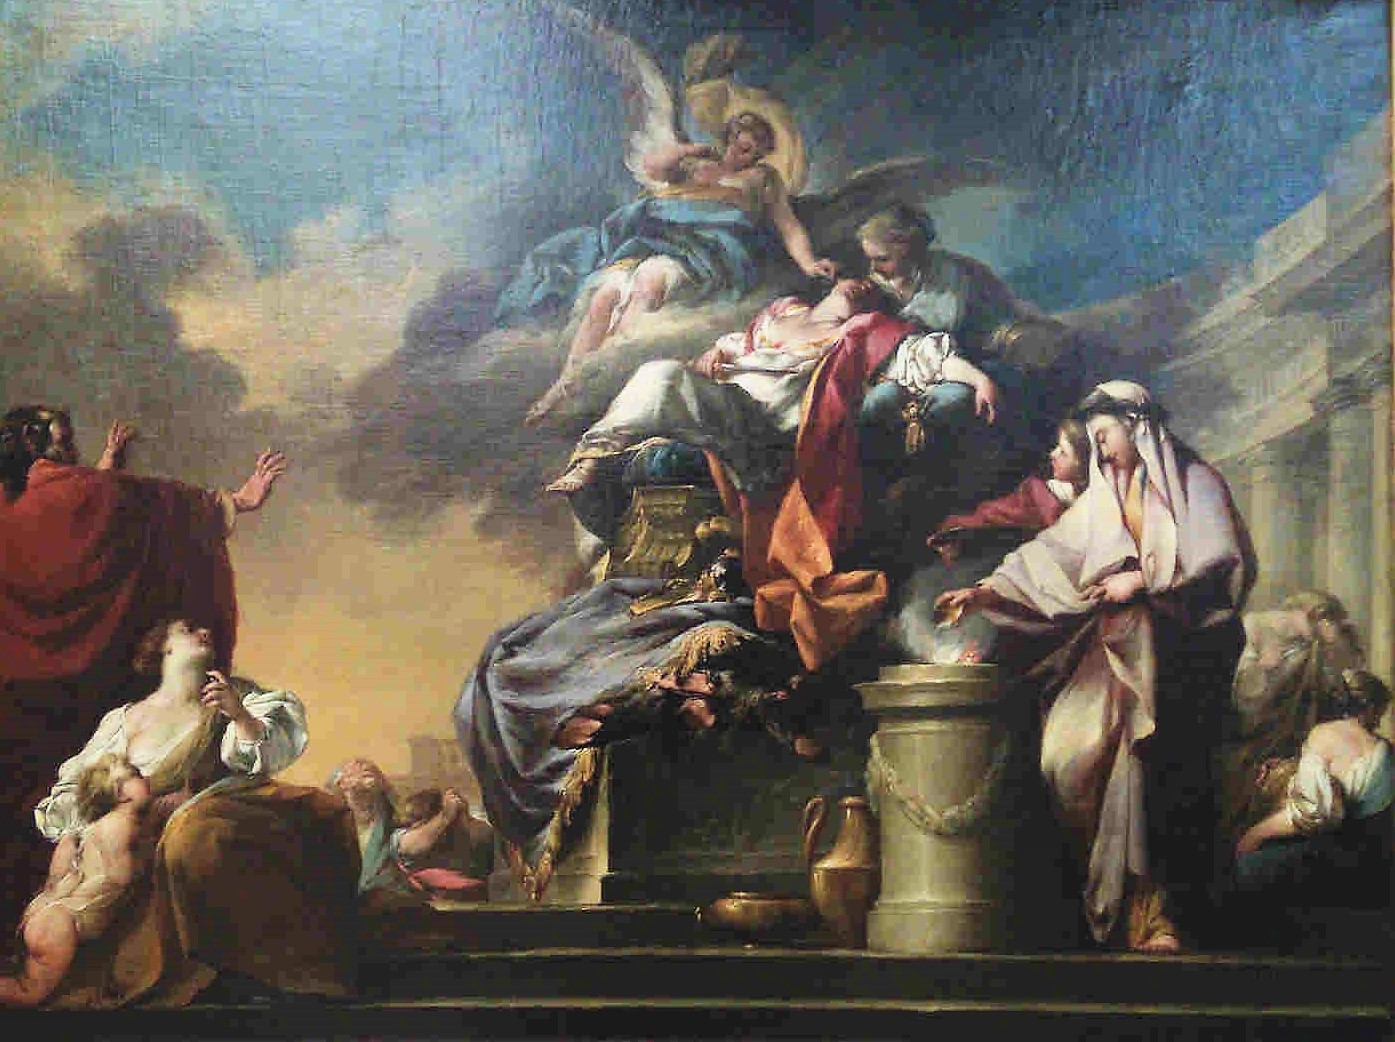 Anonyme 1750-60 Mort de Didon Musee de Nancy